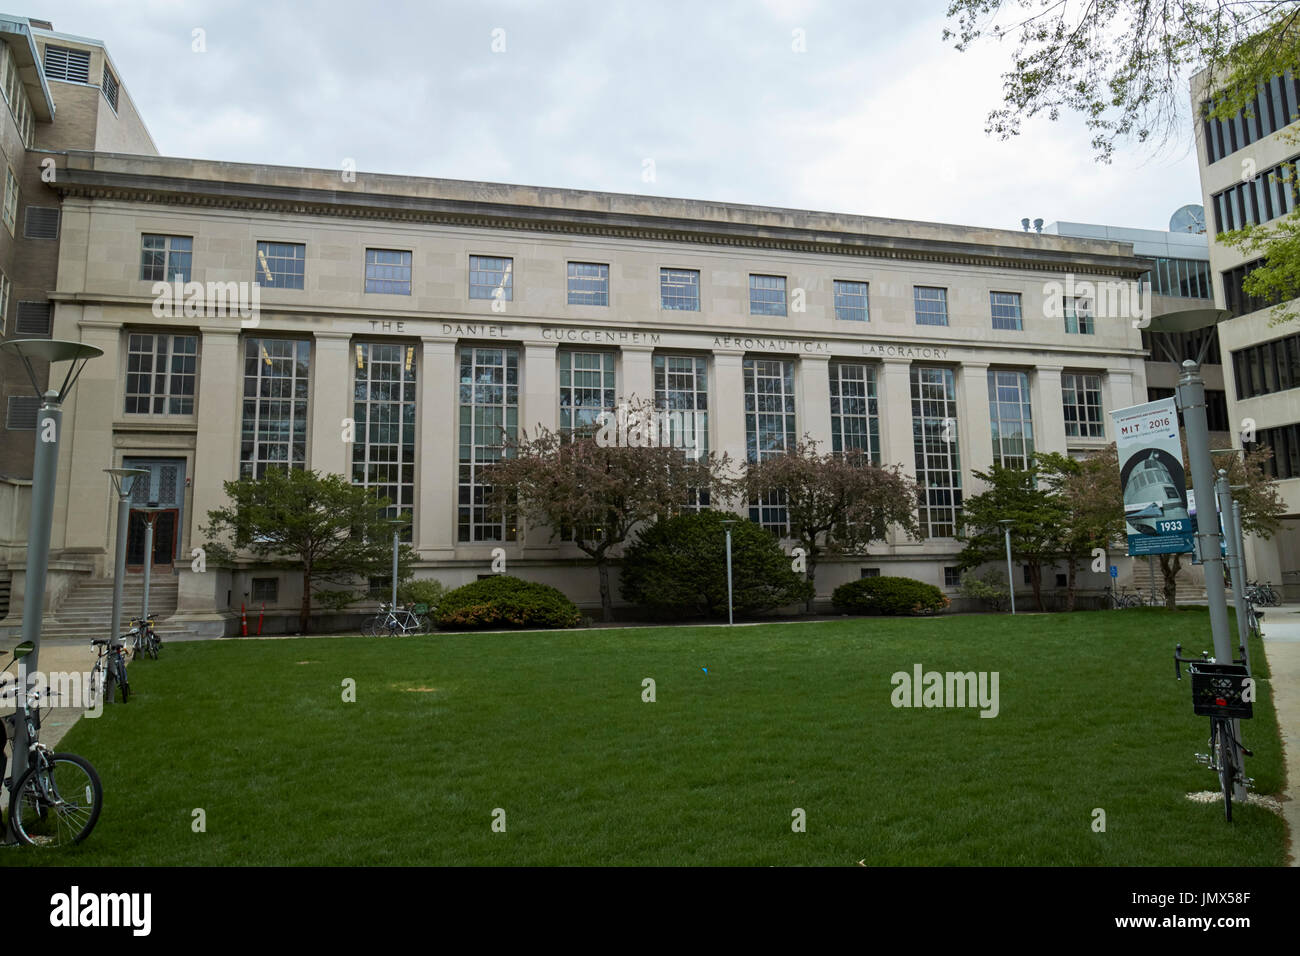 daniel guggenheim aeronautical laboratory MIT massachusetts institute of technology Boston USA - Stock Image